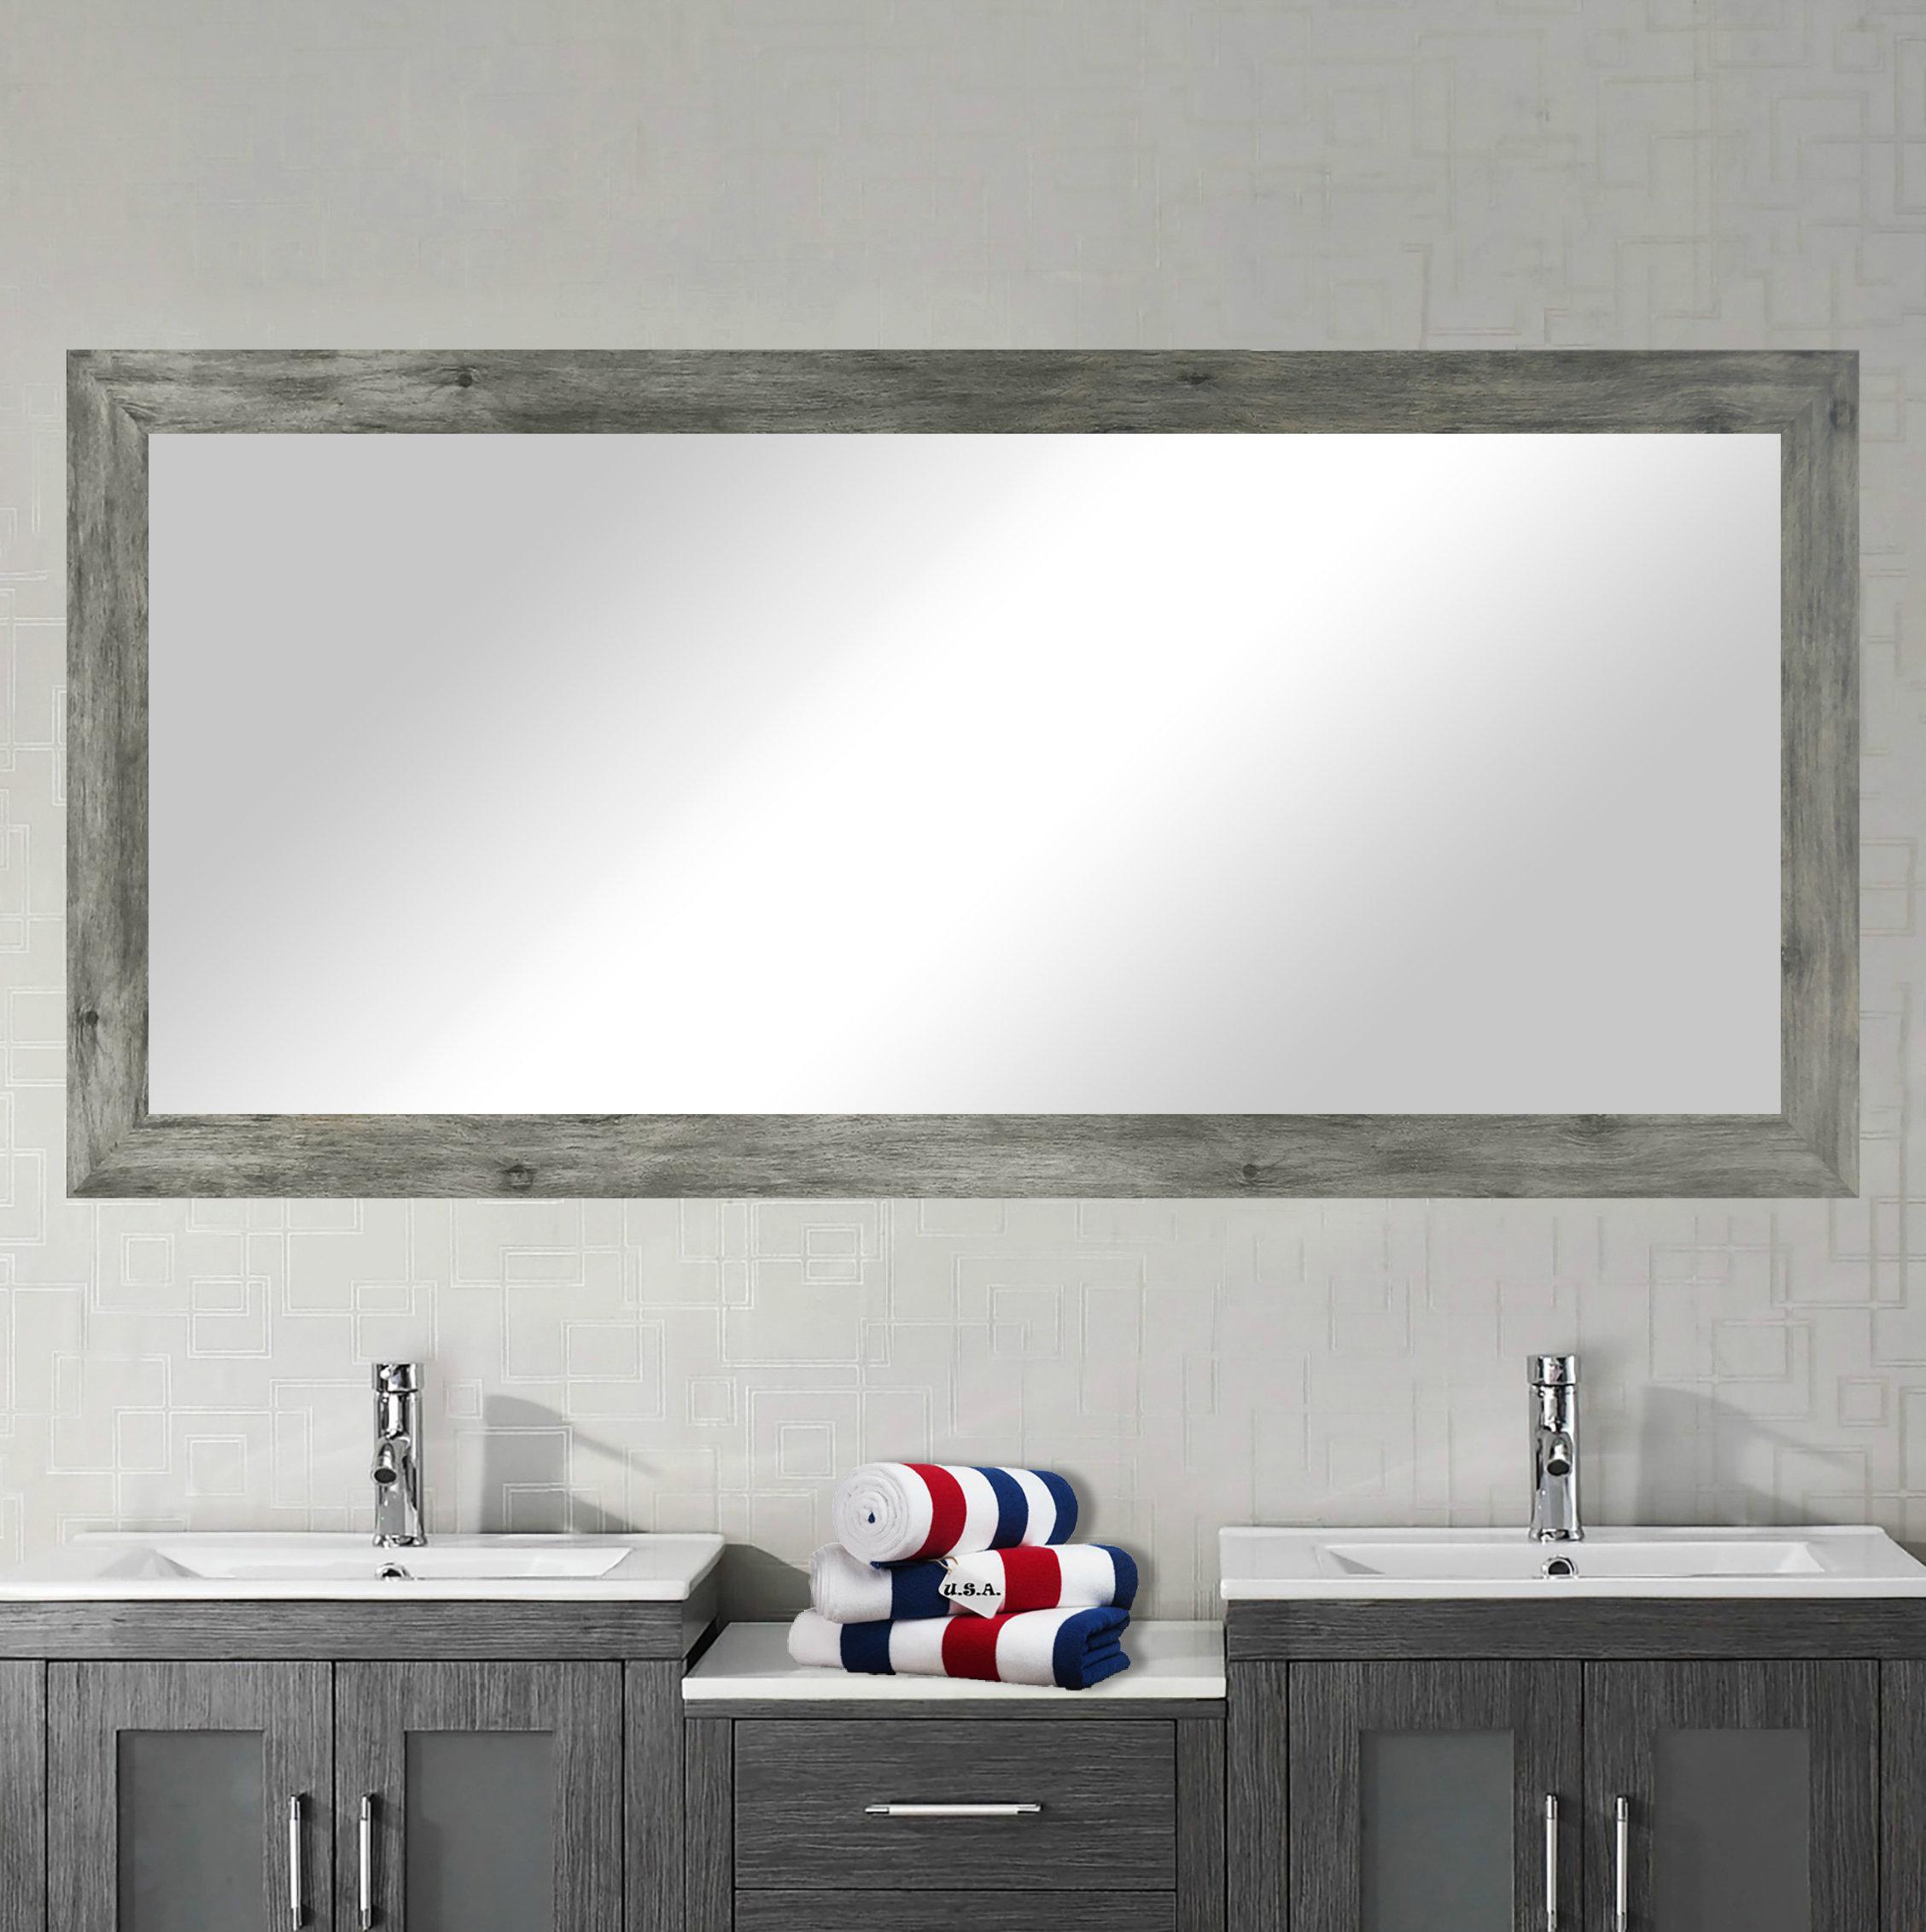 Featured Image of Landover Rustic Distressed Bathroom/vanity Mirrors